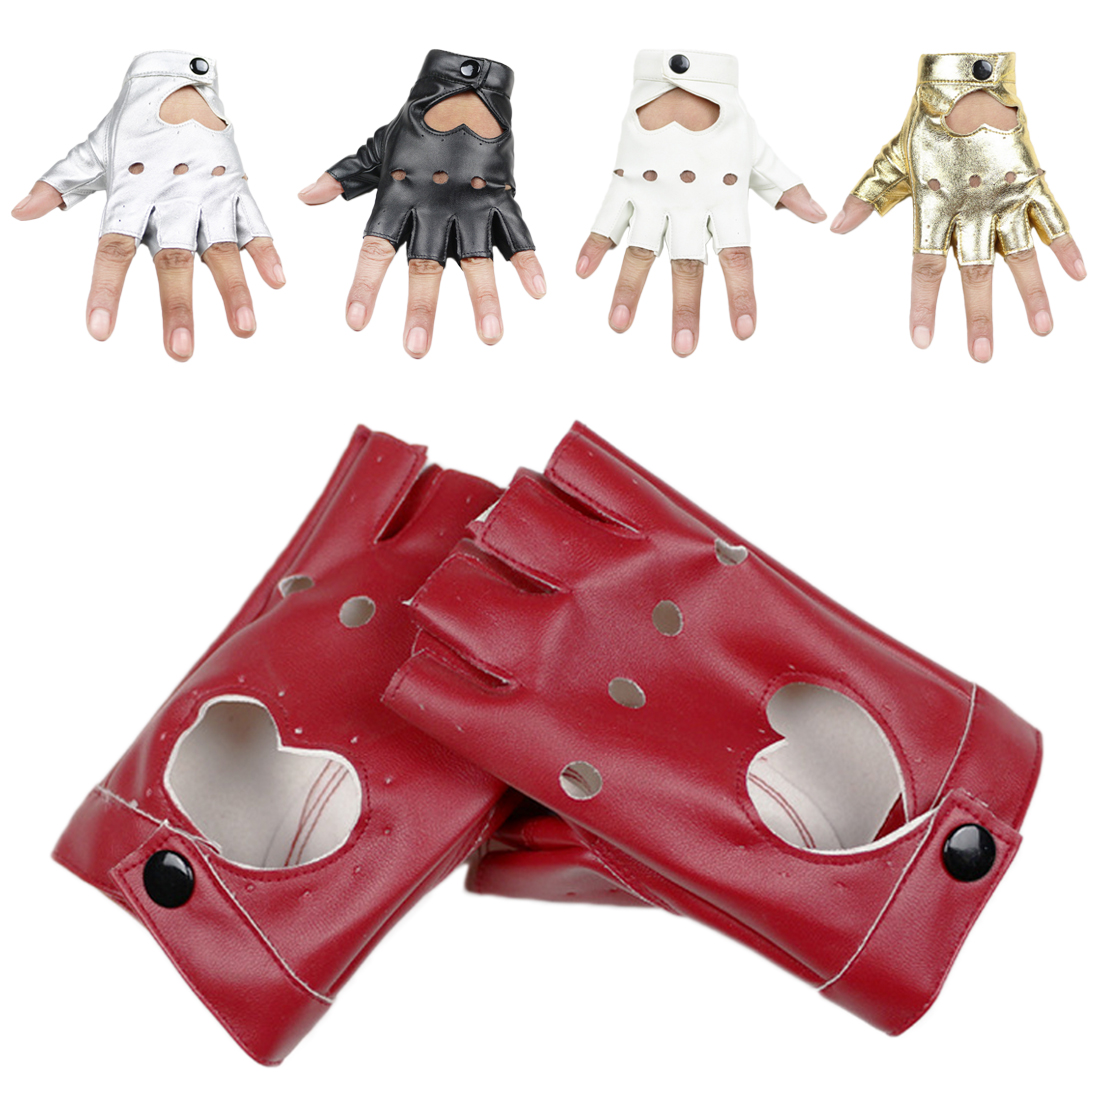 1 Pair Autumn Winter Solid Cool Heart Hollow Fingerless Gloves Black Women Fashion PU Leather Half Finger Gloves